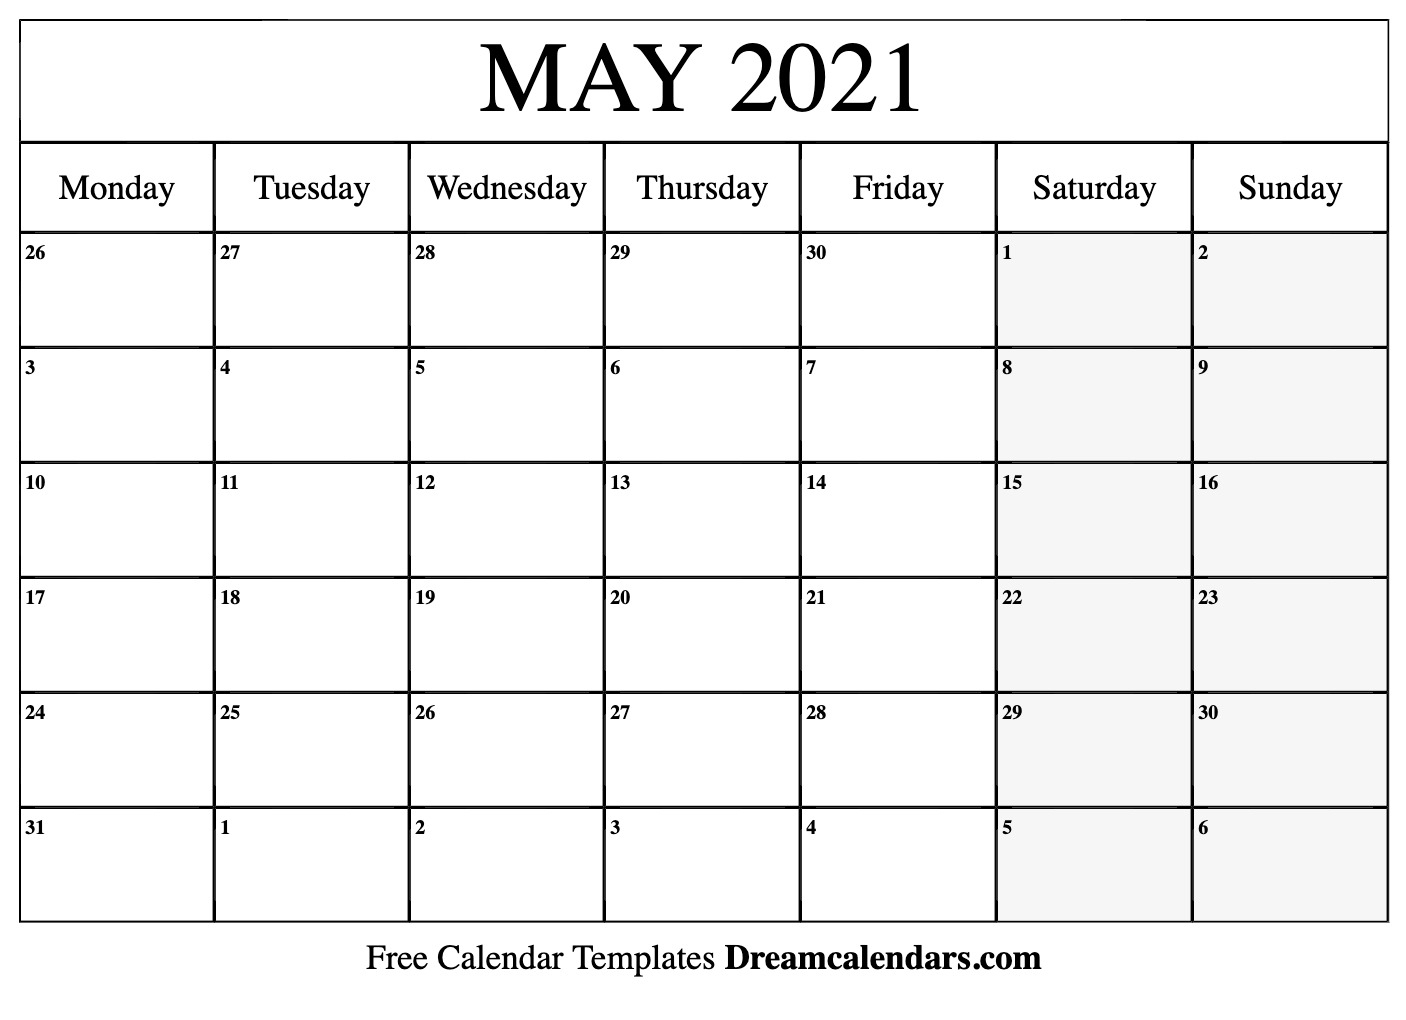 May 2021 Calendar Free Blank Printable Templates 1